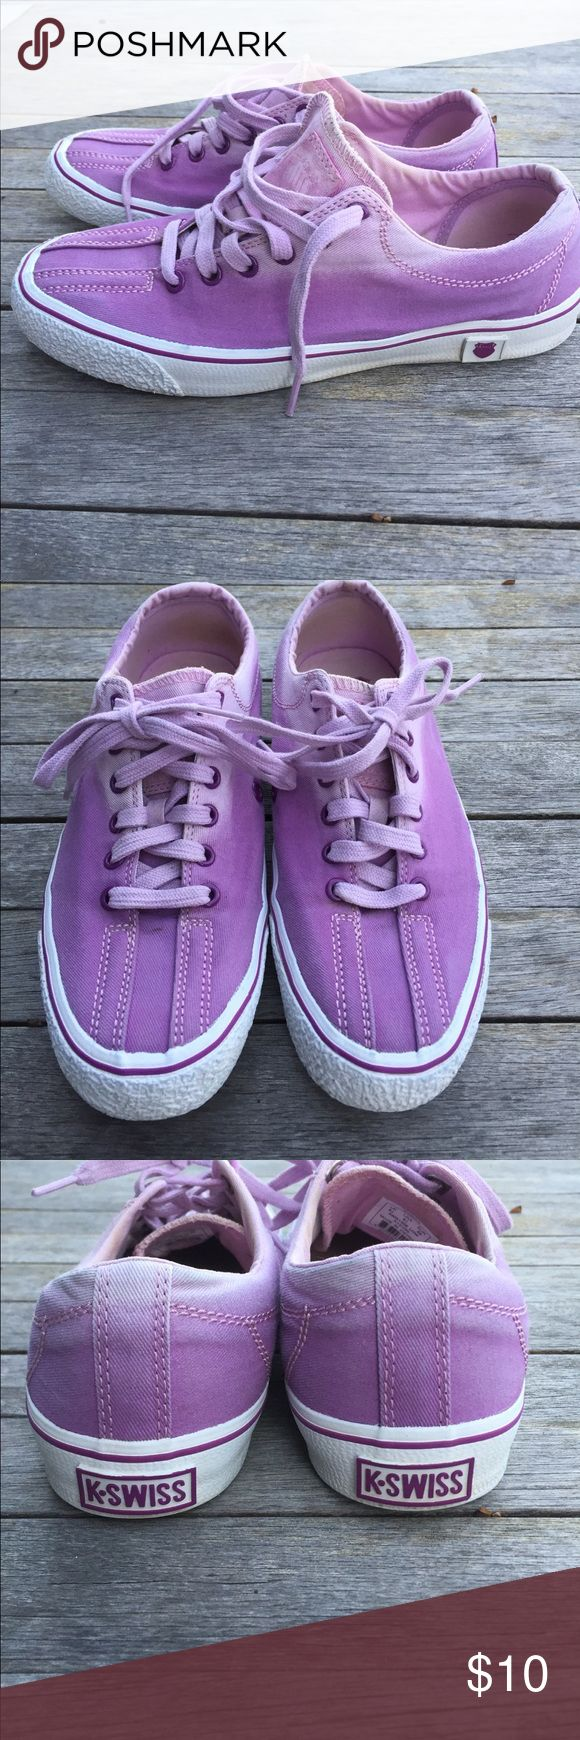 Womens K Swiss sneaker Women's K Swiss sneaker, size 8 1/2, purple with fading around ankle. Signs of minor wear, but an allall-around cute comfy casual sneaker. K Swiss Shoes Sneakers